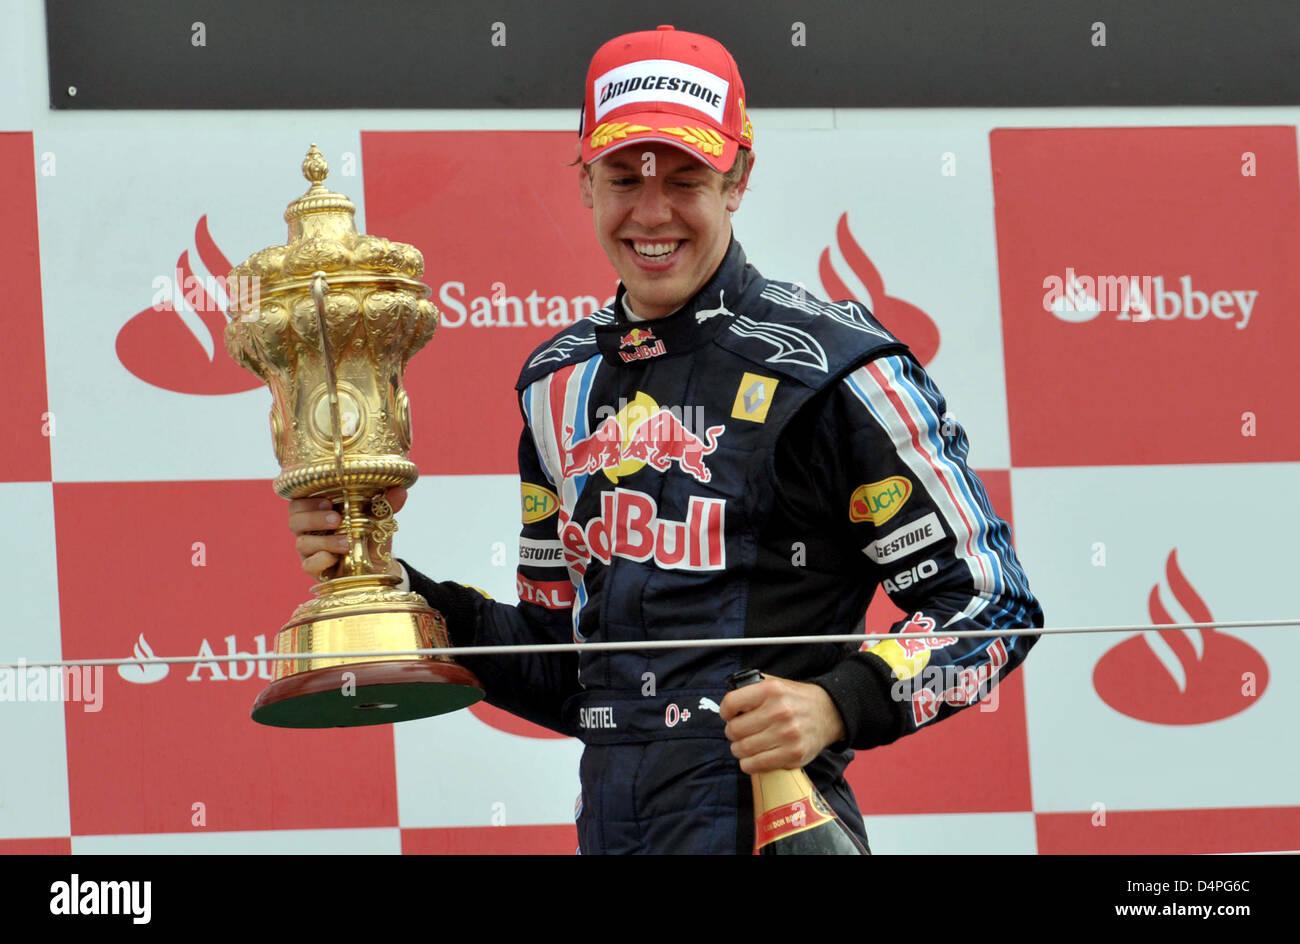 Winner of the race, German Formula One driver Sebastian Vettel (R) of Red Bull celebrates on the podium after the - Stock Image